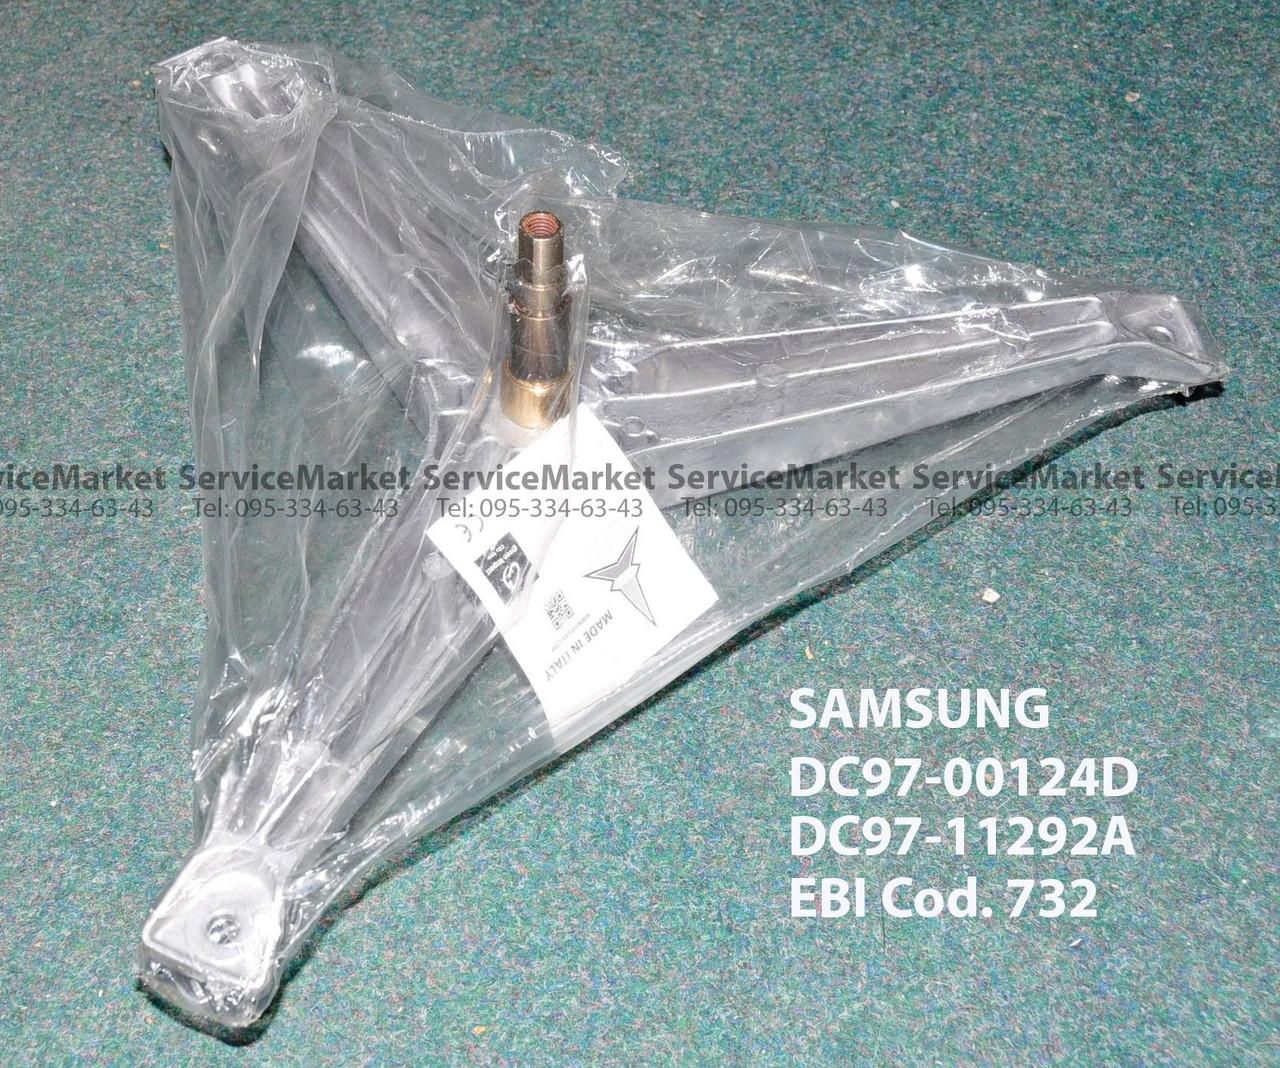 Хрестовина барабана пральної машини Samsung (Самсунг) оригінал DC97-00124d EBI Cod. 732 Italy